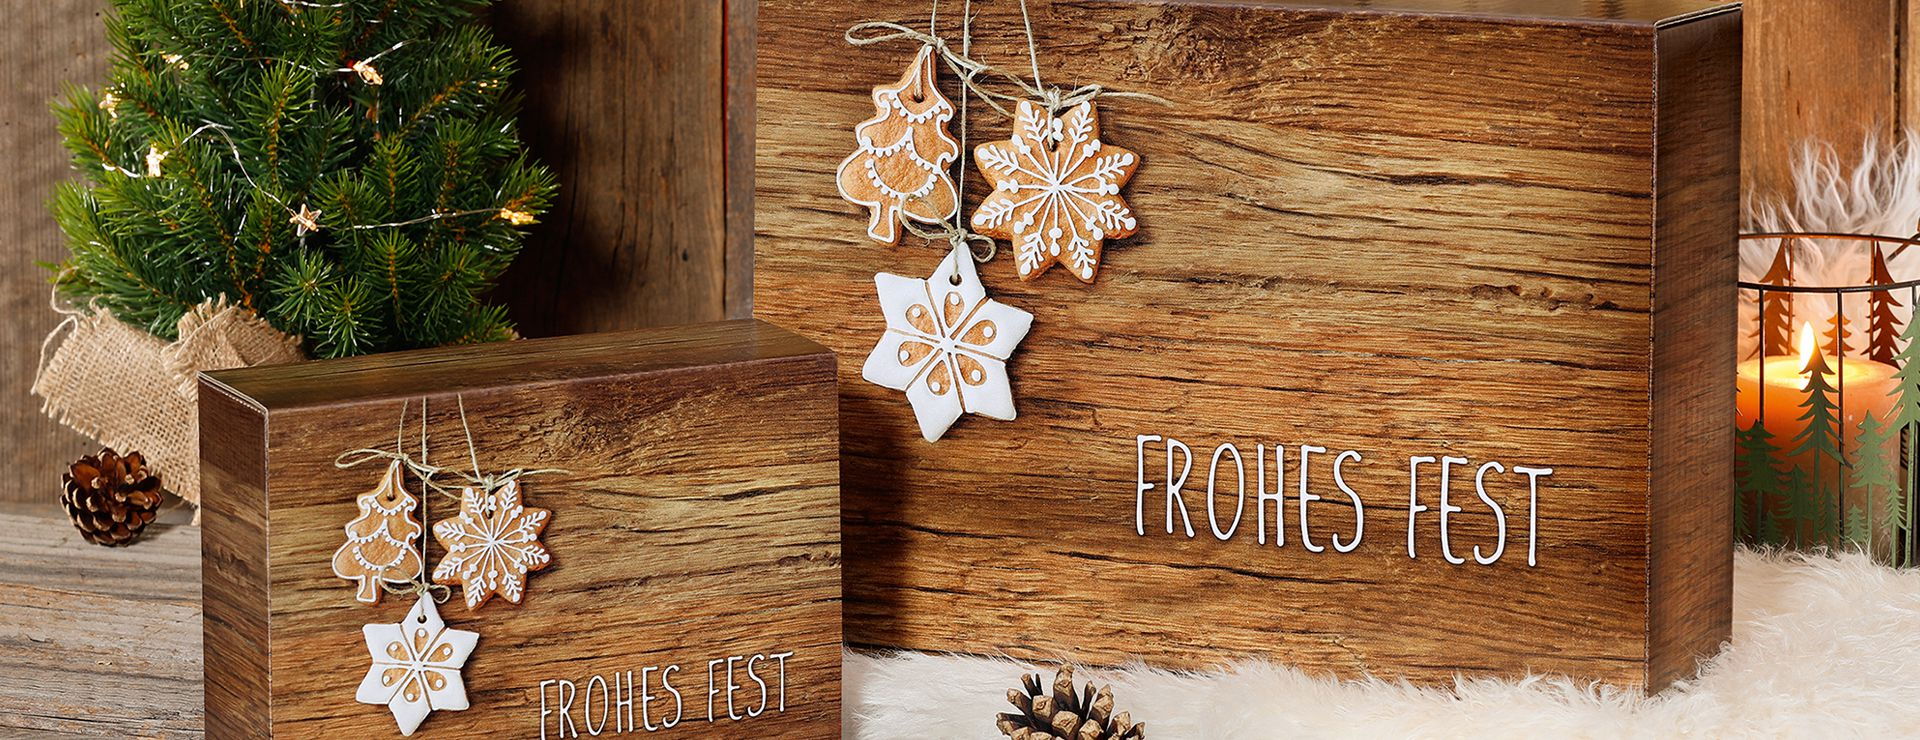 Präsentkartons in Holzoptik mit Weihnachtsdekoration